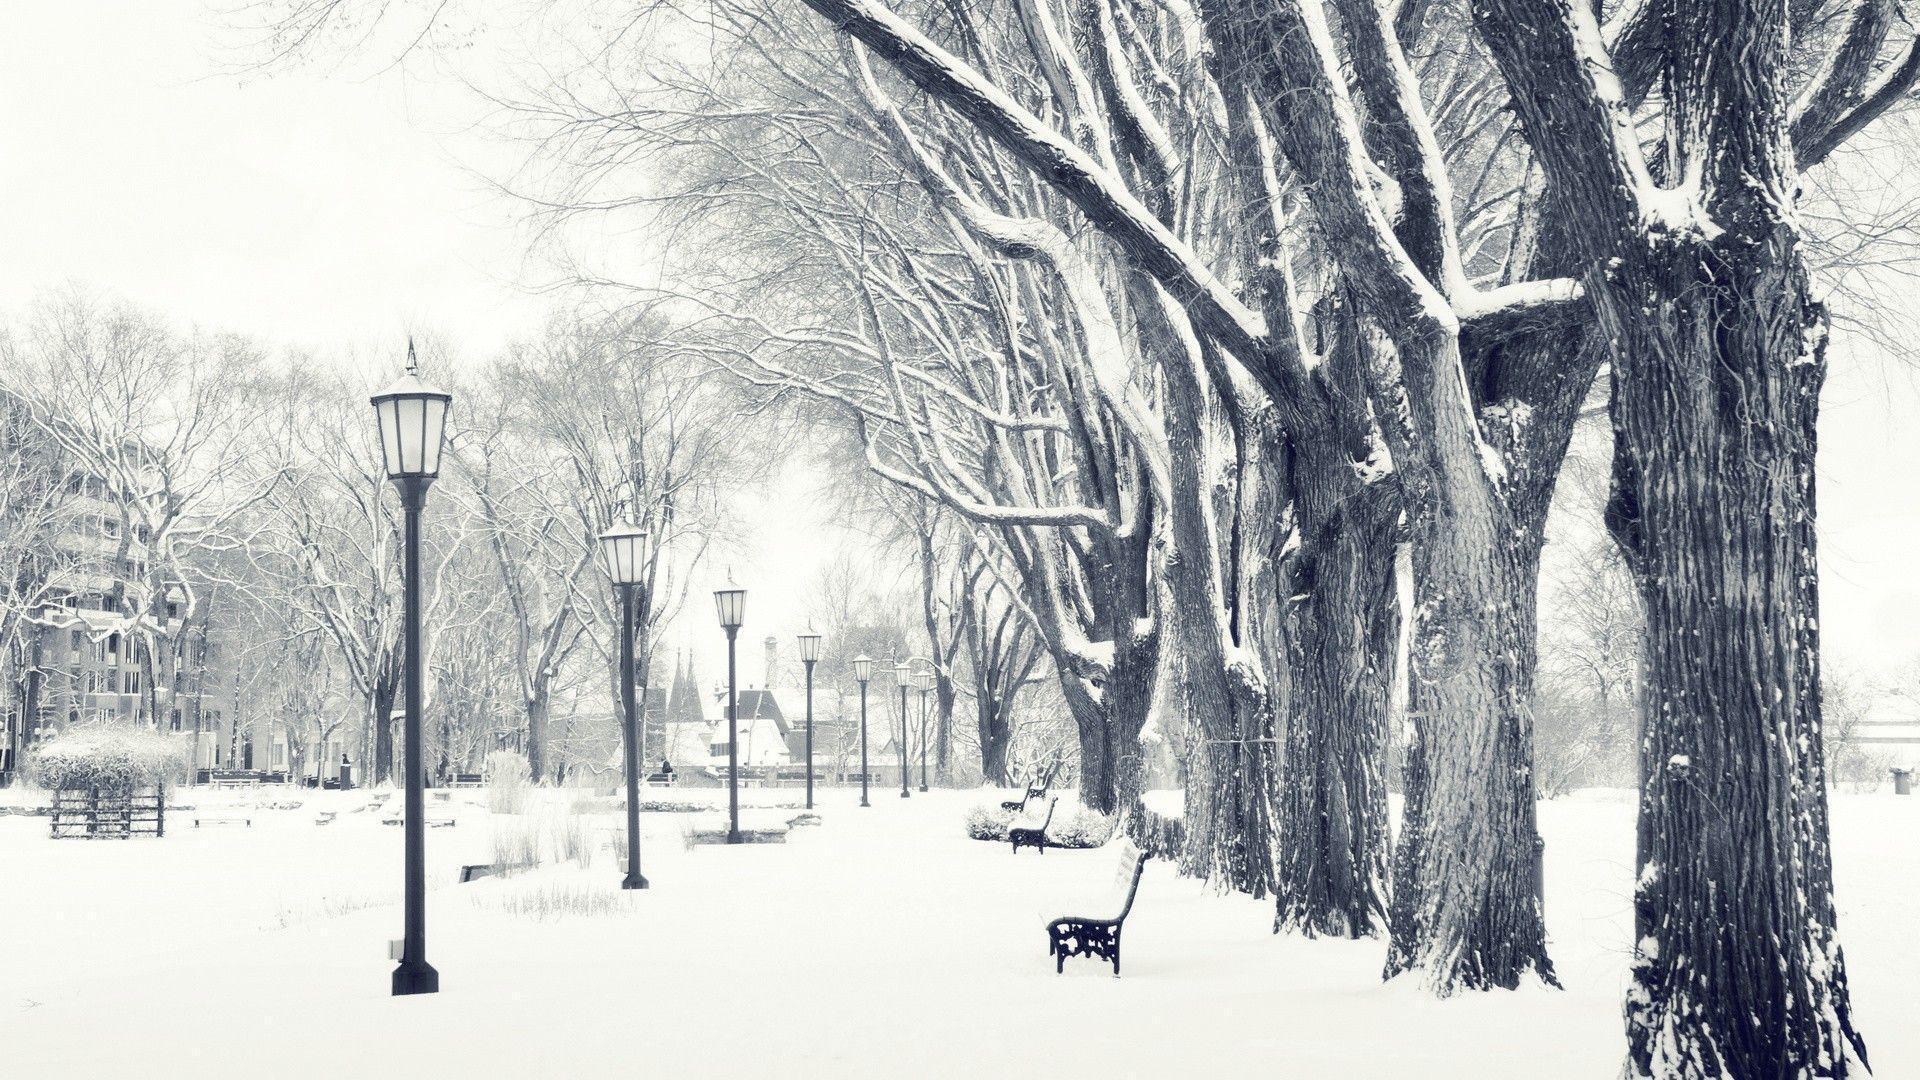 Paesaggi Invernali Tumblr